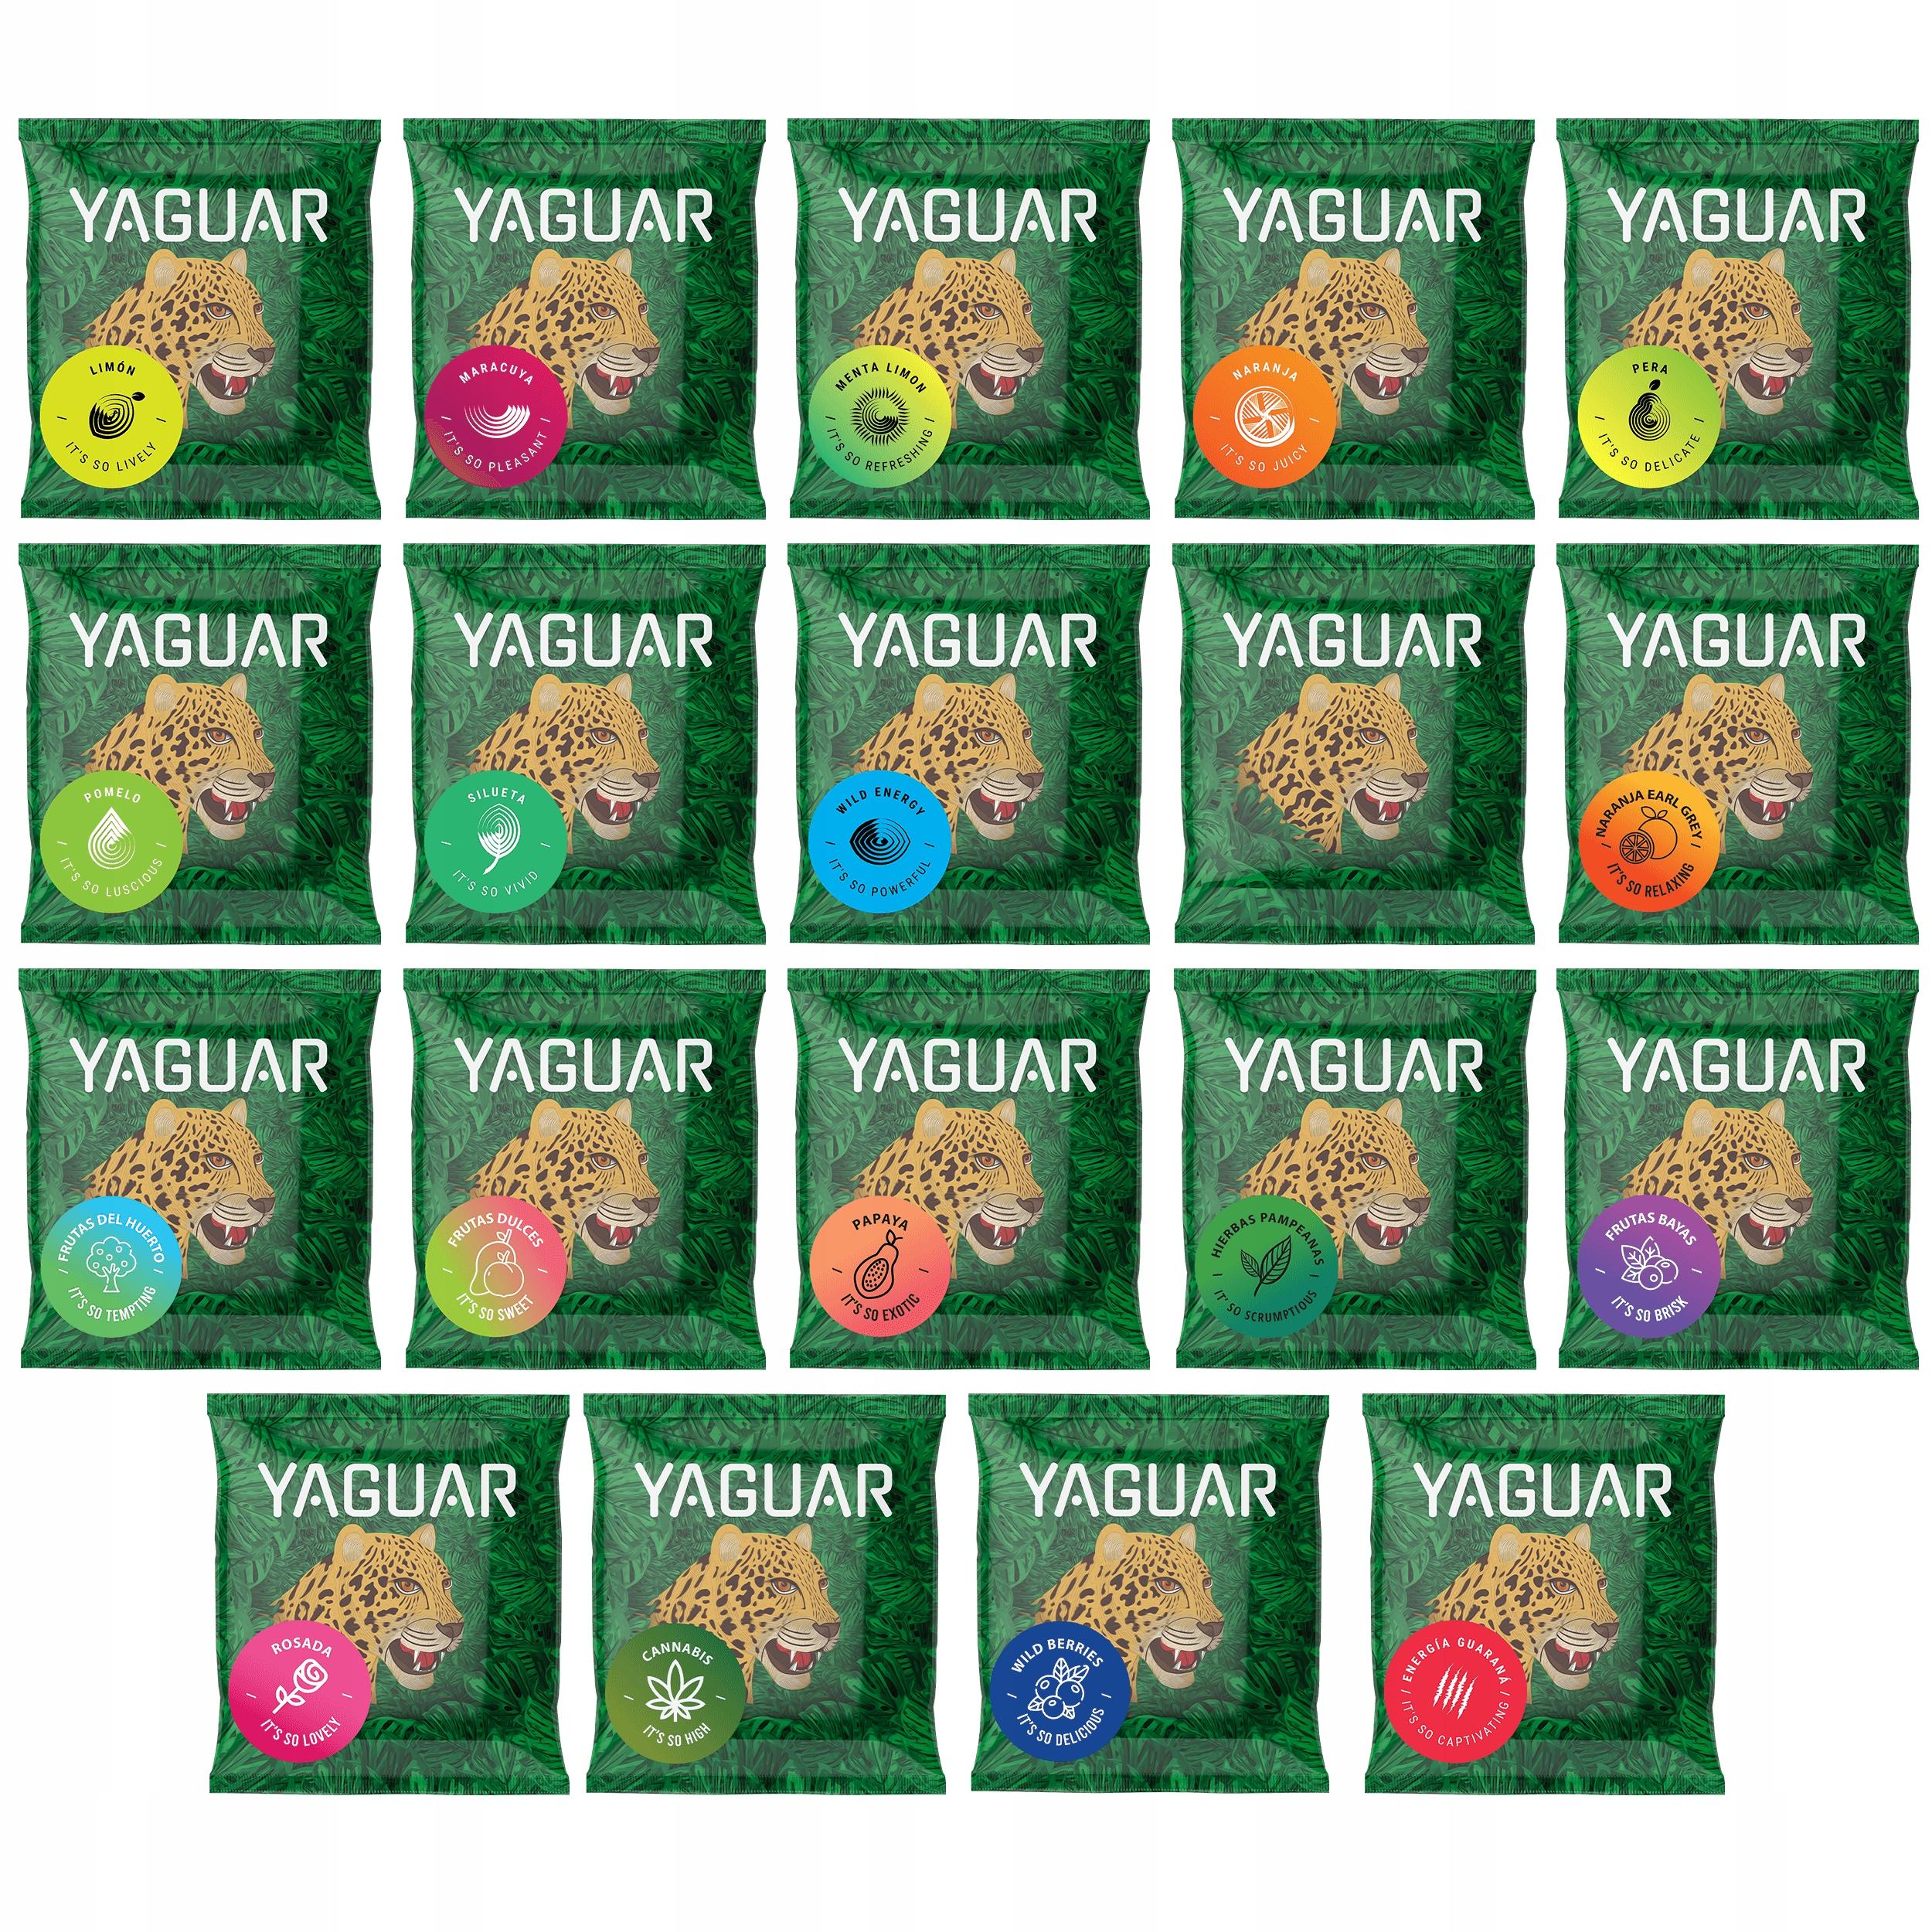 Yerba Mate Sample 50g Yaguar Сравните вкусы